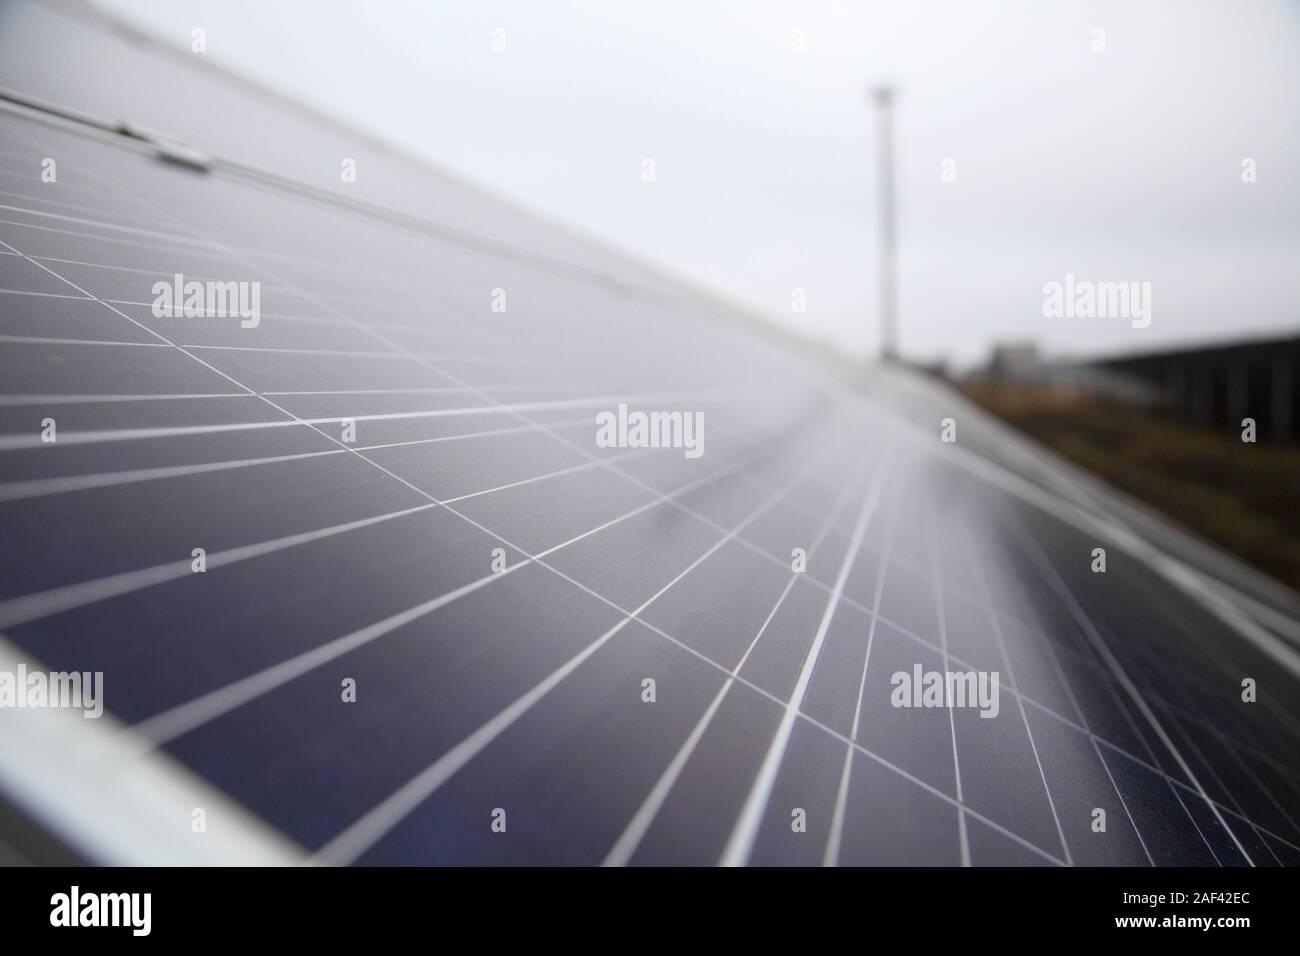 Installation of solar panels. Solar panel produces green, environmentally friendly energy from the sun.  Installation of solar panels in rural areas. Stock Photo